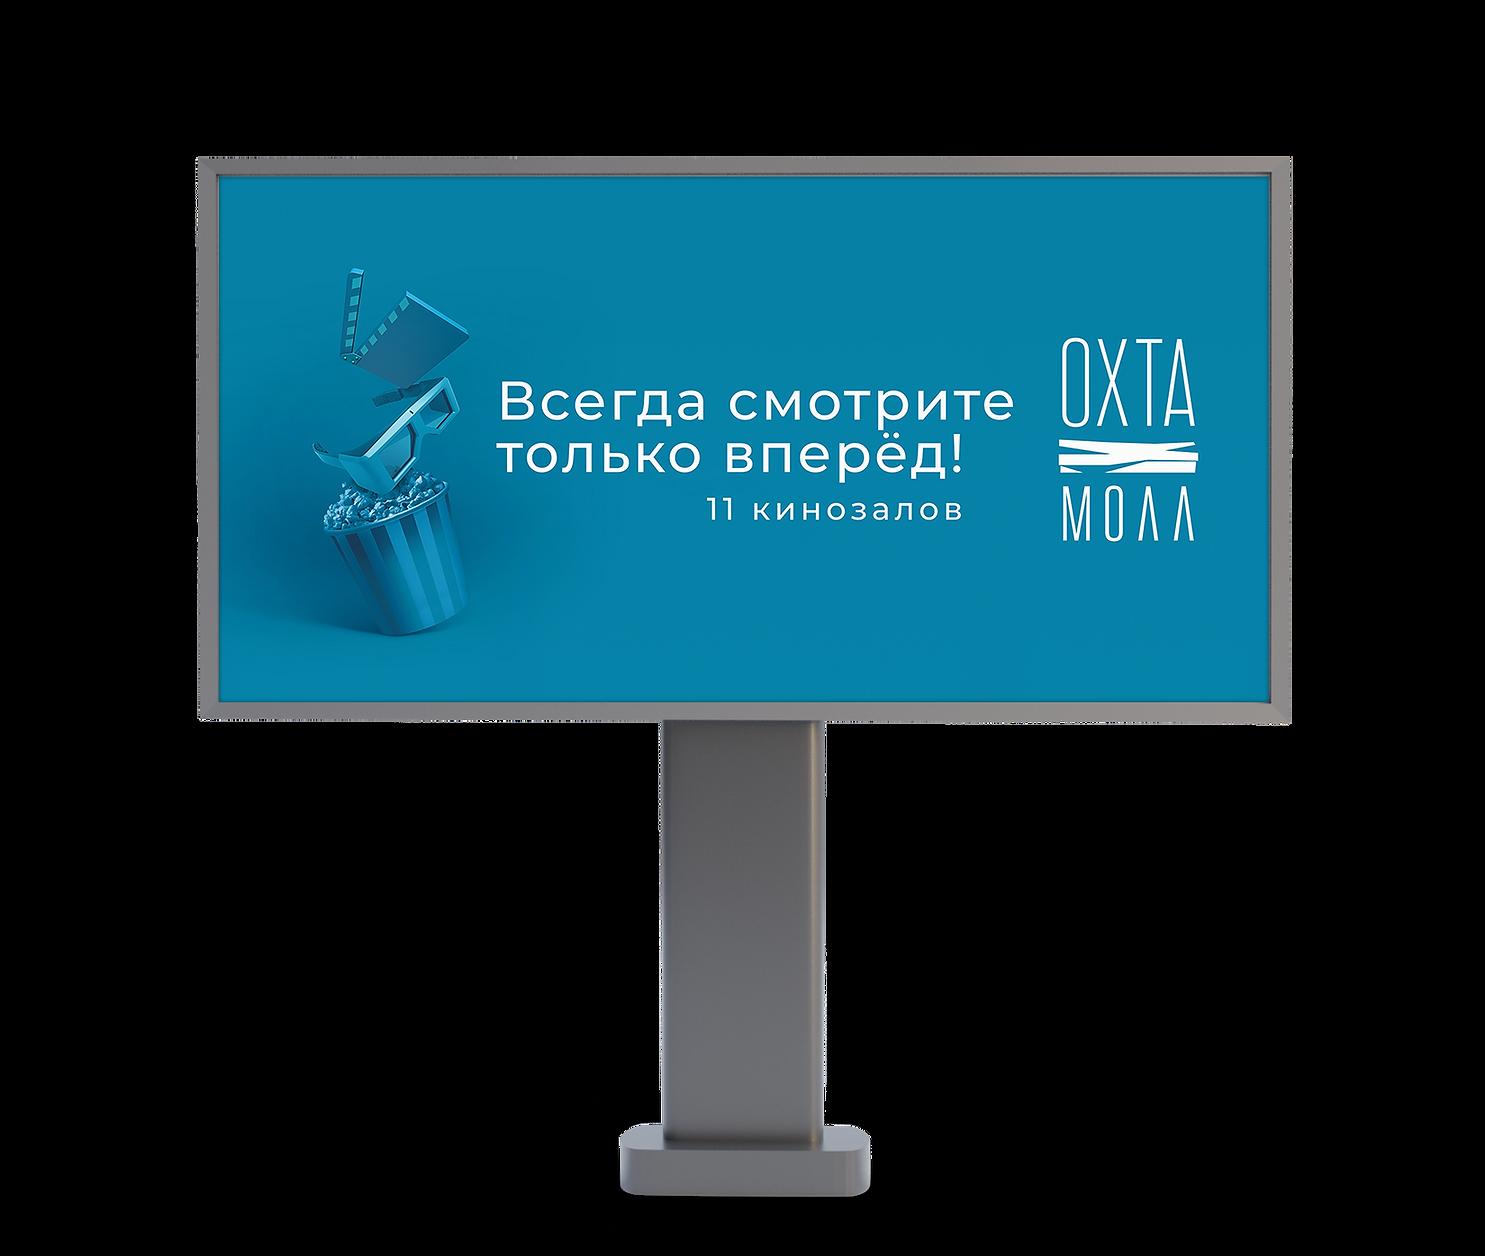 Охта-Молл-Имиджевая-кампания-1.png